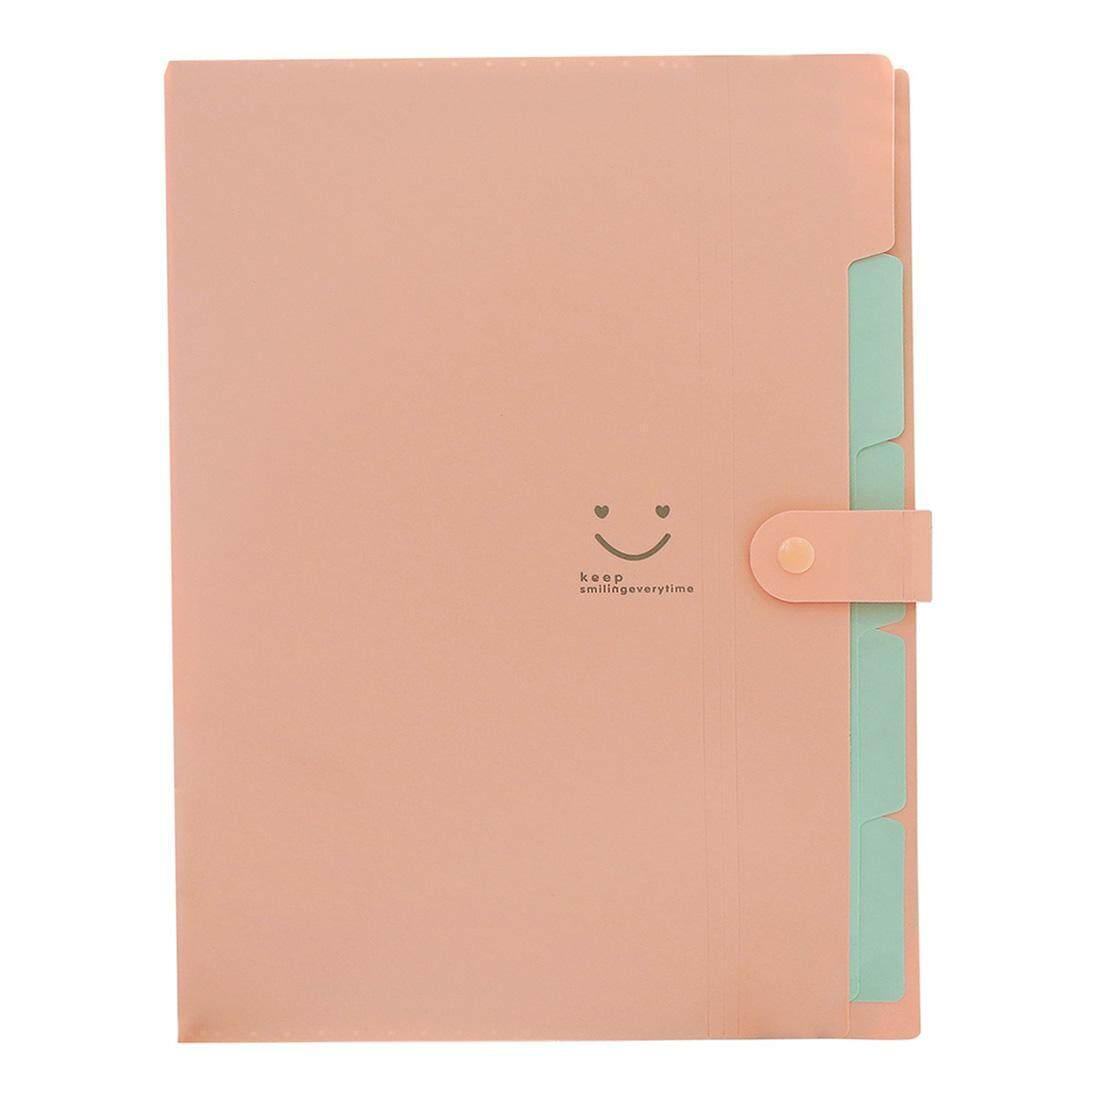 956dfeedd1a Kawaii FoldersStationery Carpeta File Folder 5layers Archivadores Rings A4  Document Bag Office Carpetas(Pink)